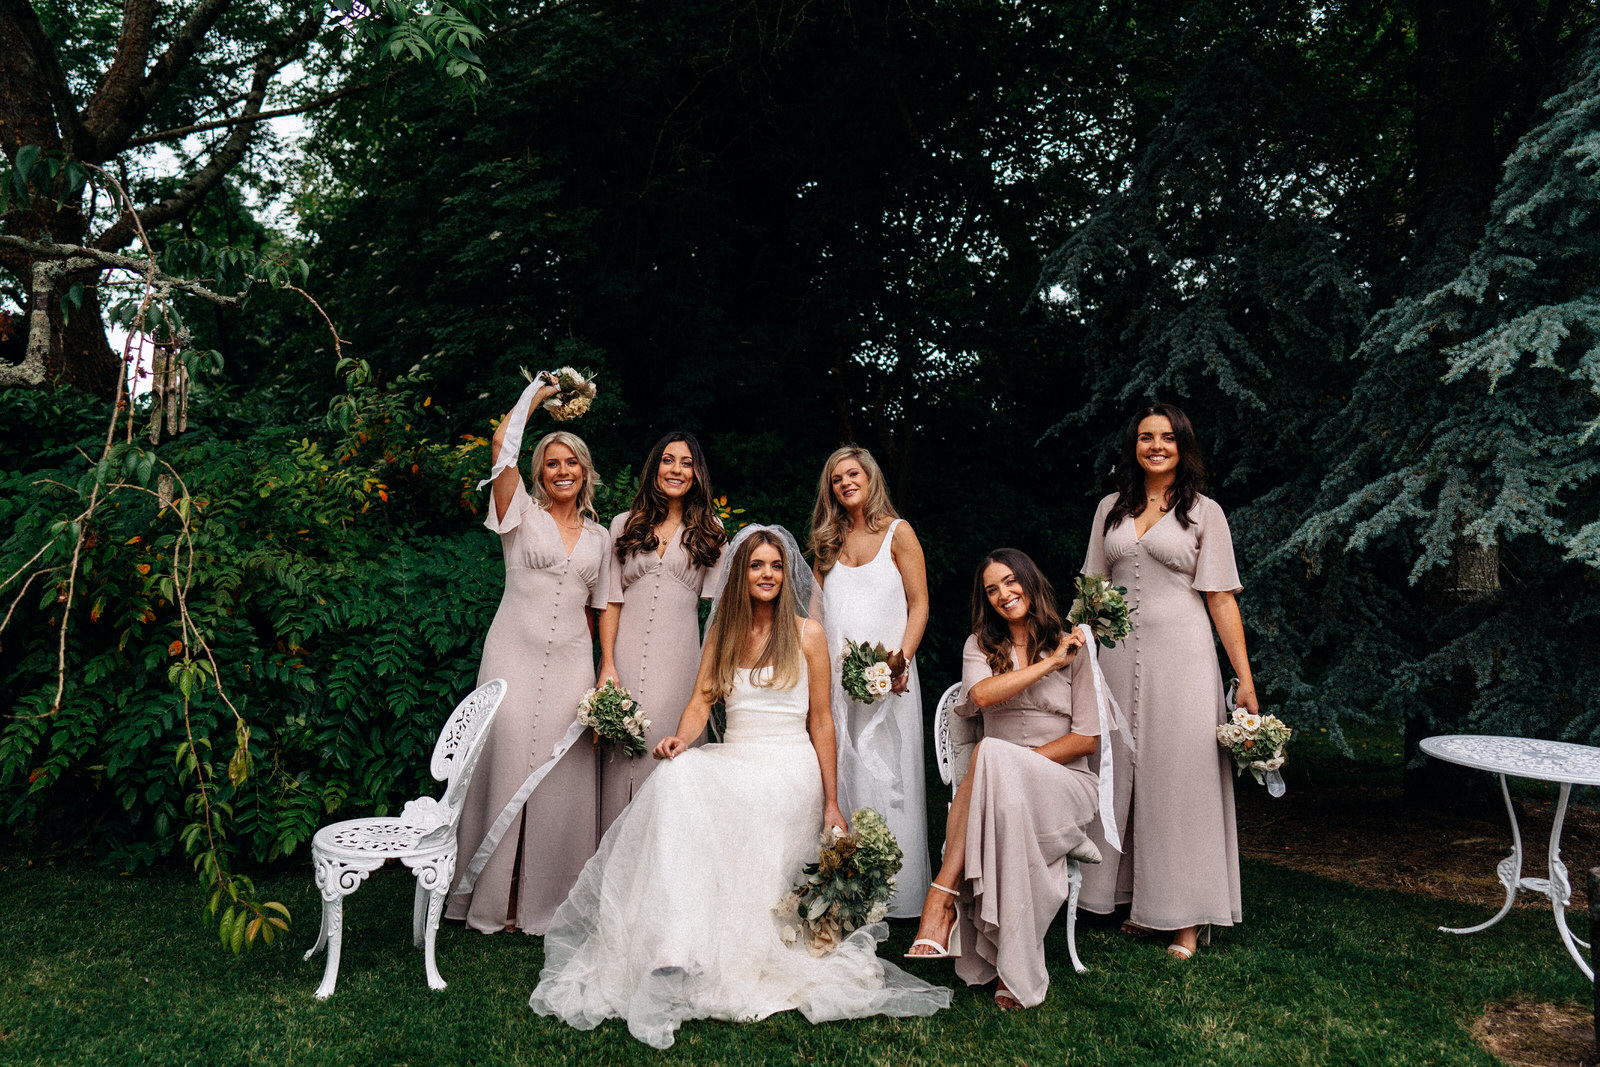 wedding photographer dublin 1,012 258